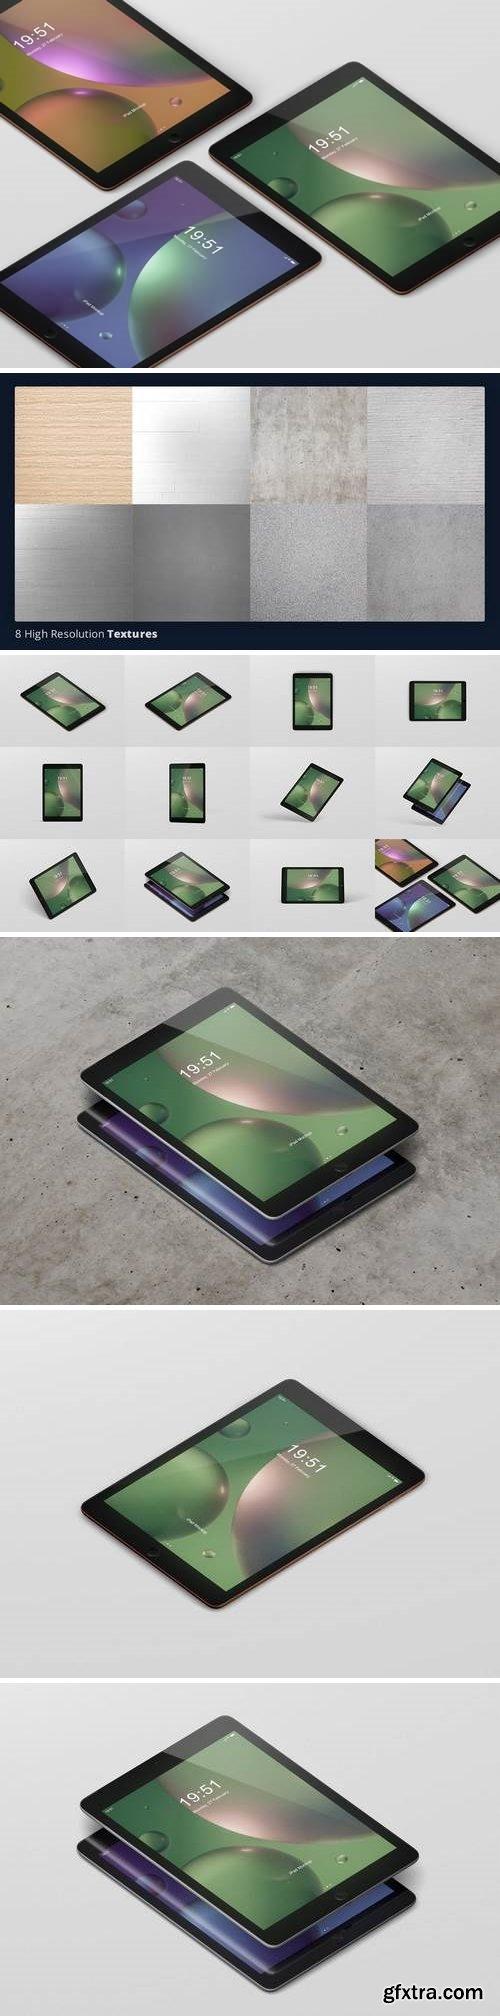 Tablet Screen Mockup